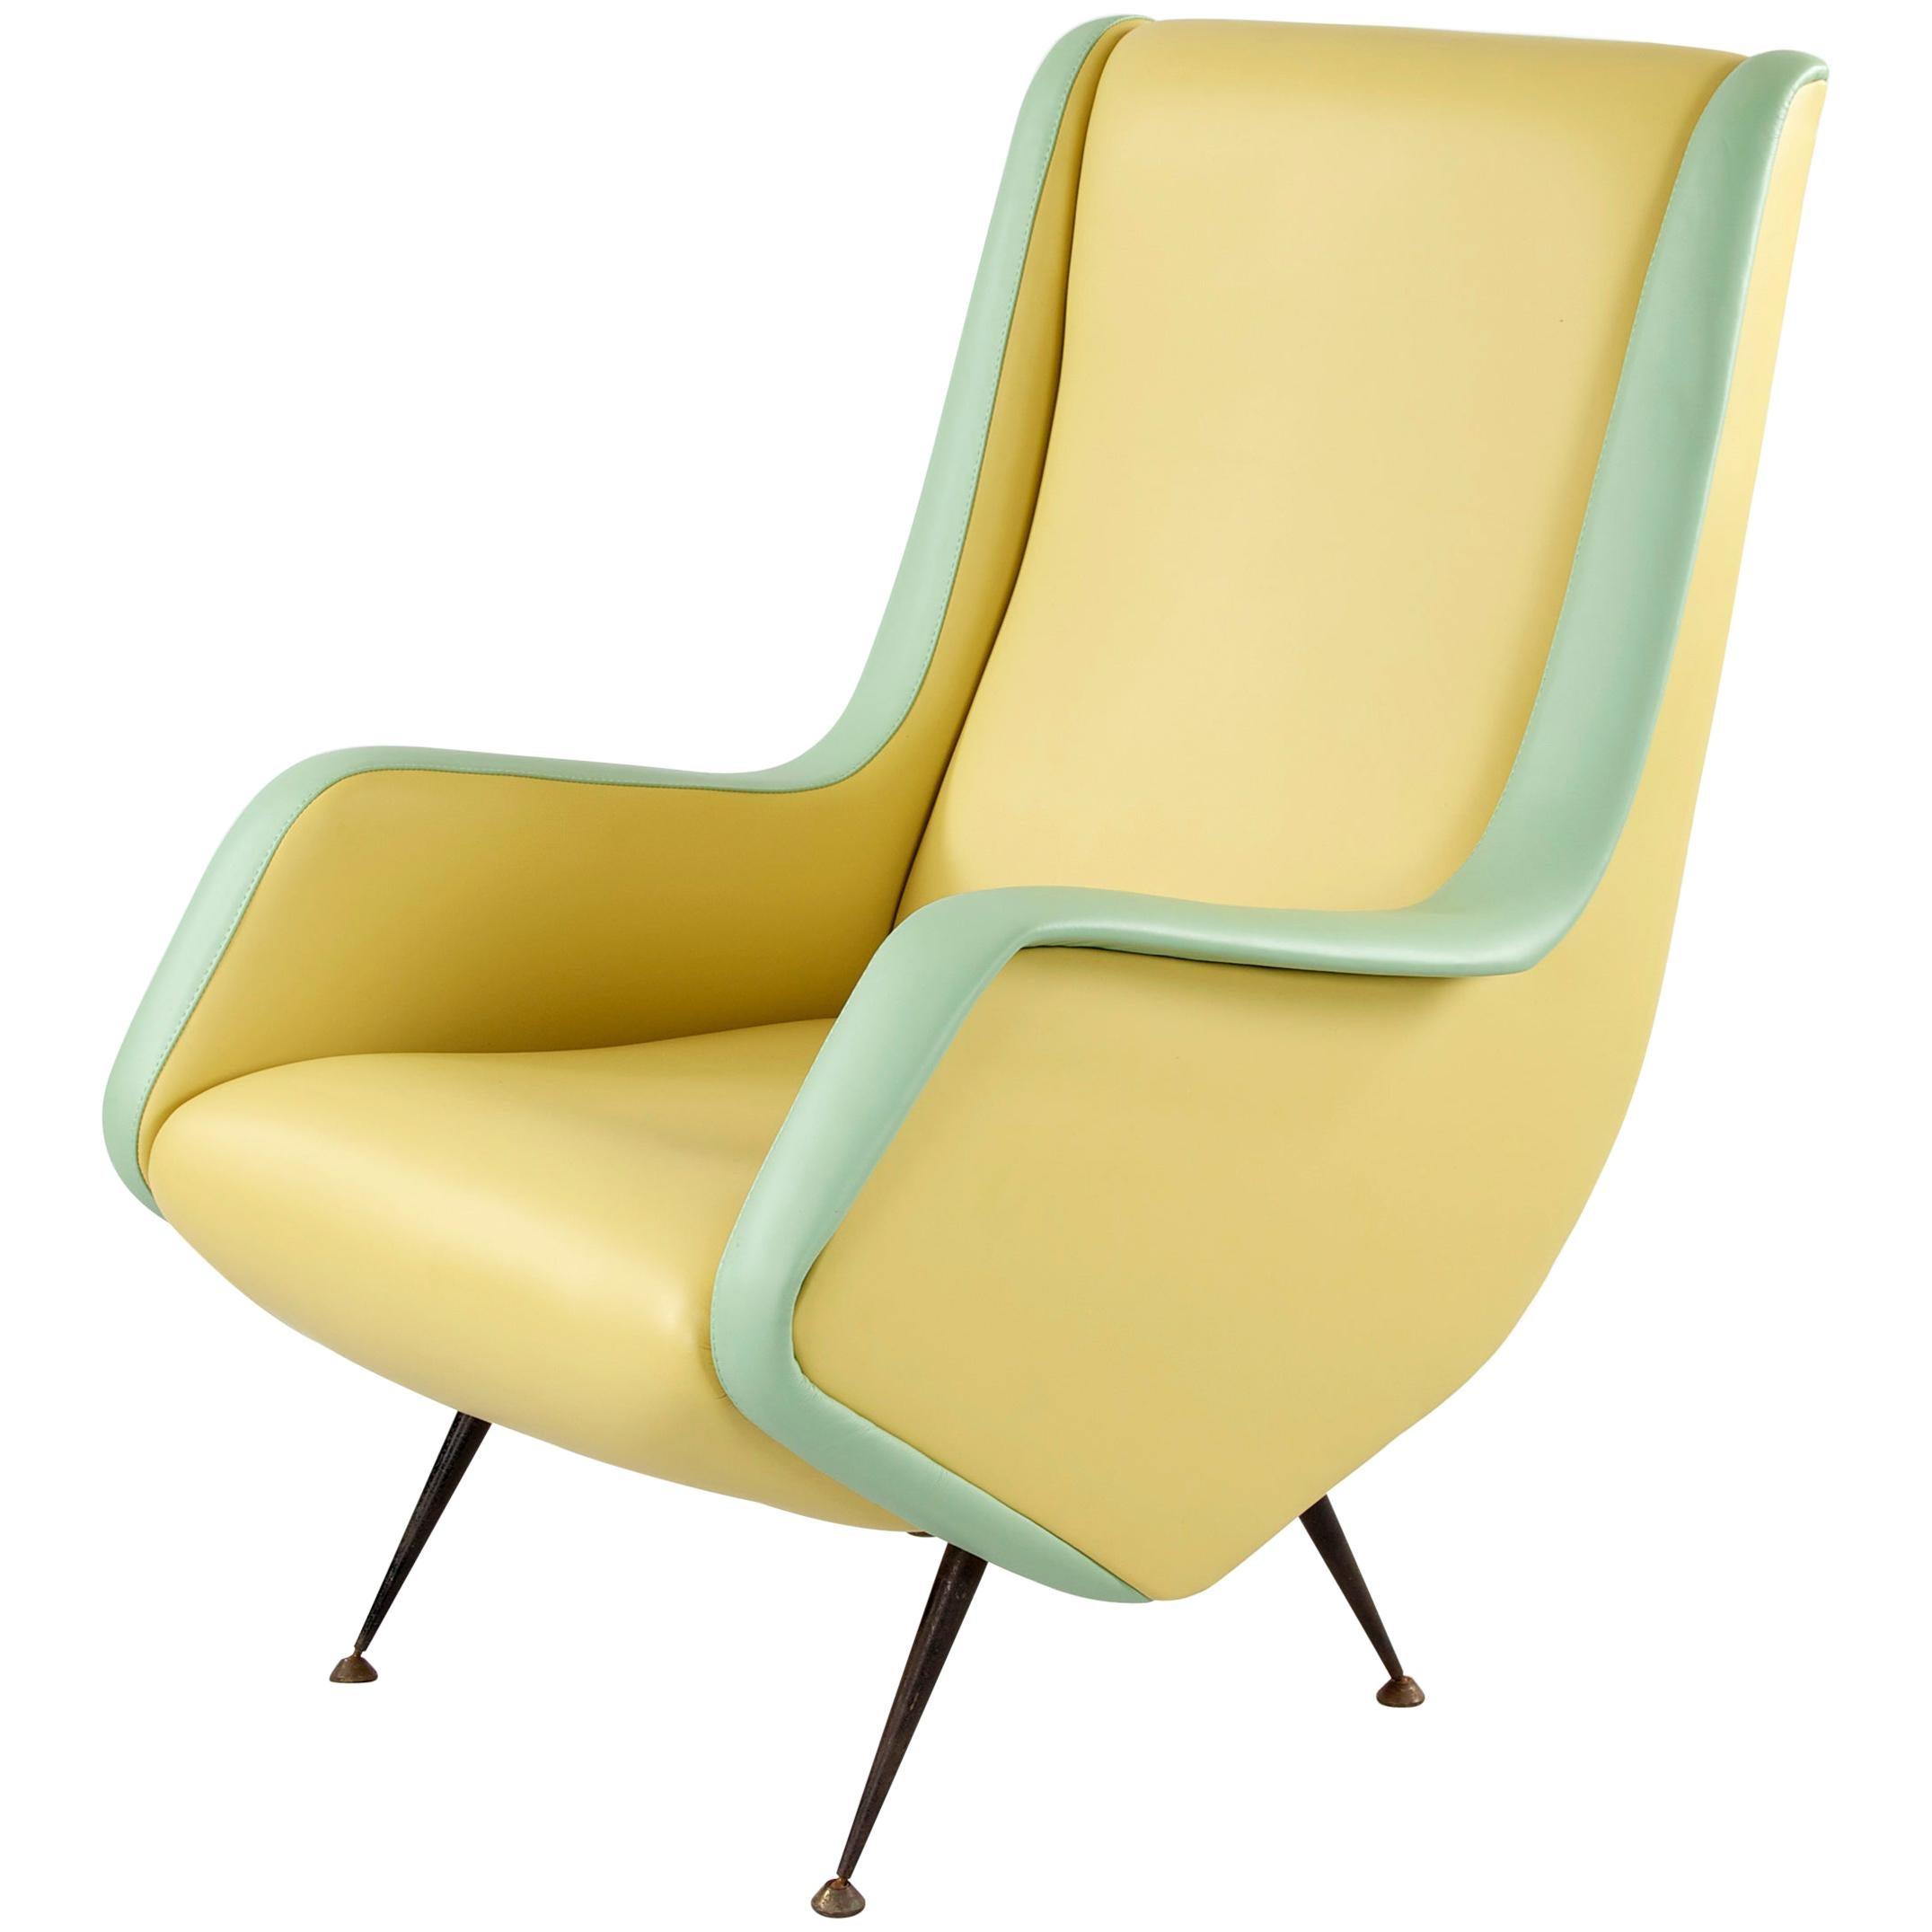 Two-Tone Leather Cover Chairs, Design by Aldo Morbelli for I.S.A. Bergamo, 1950s